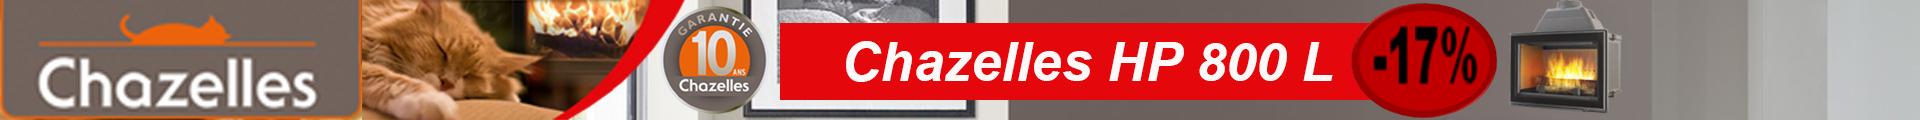 chazelles_promosiya1